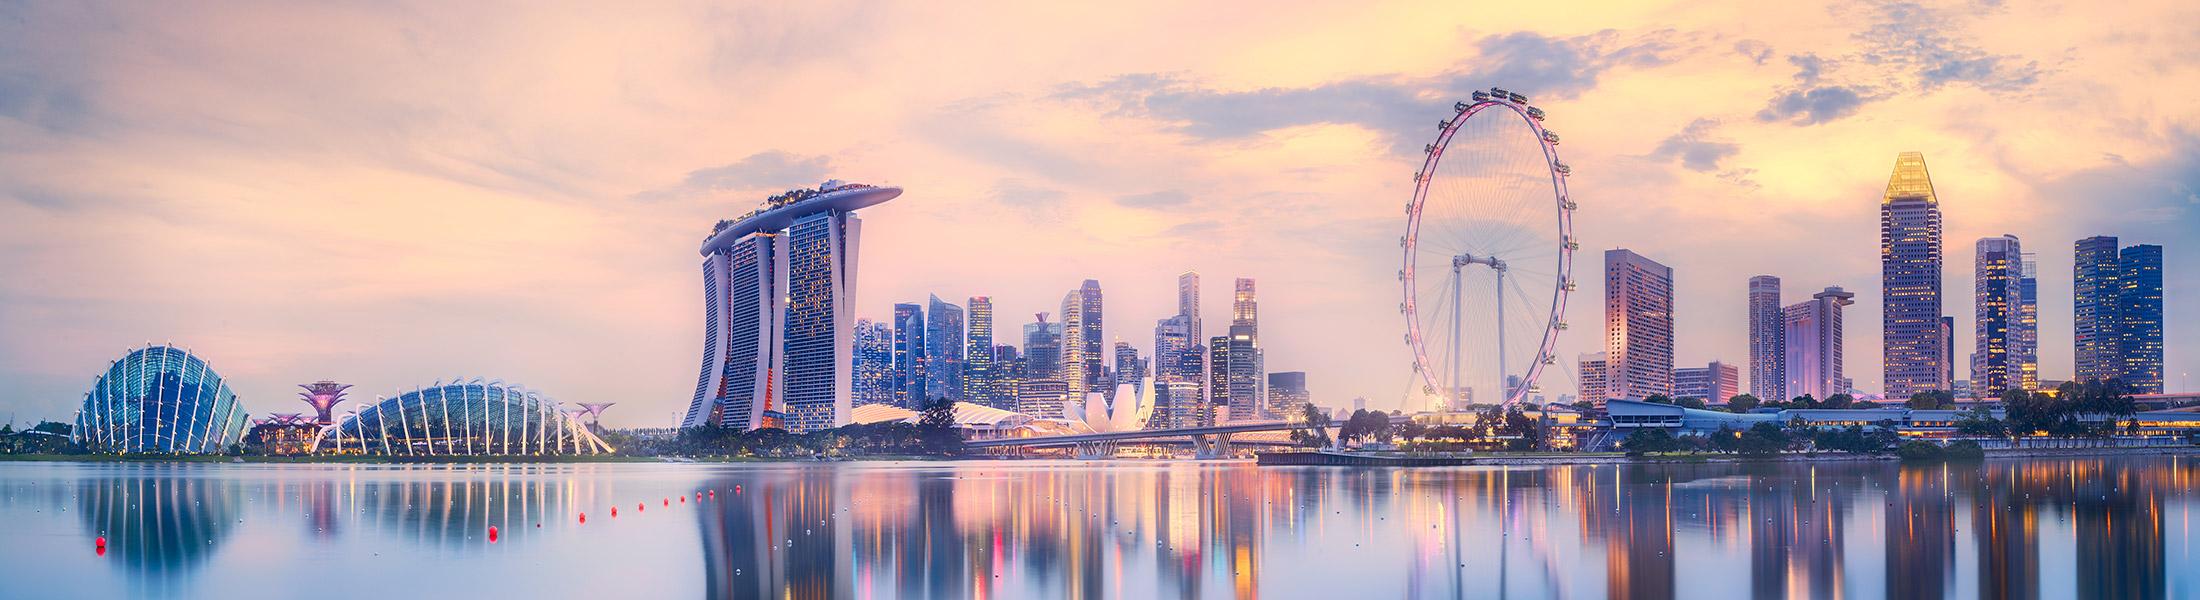 Singapore City Skyline on an Australia Multi-centre holiday